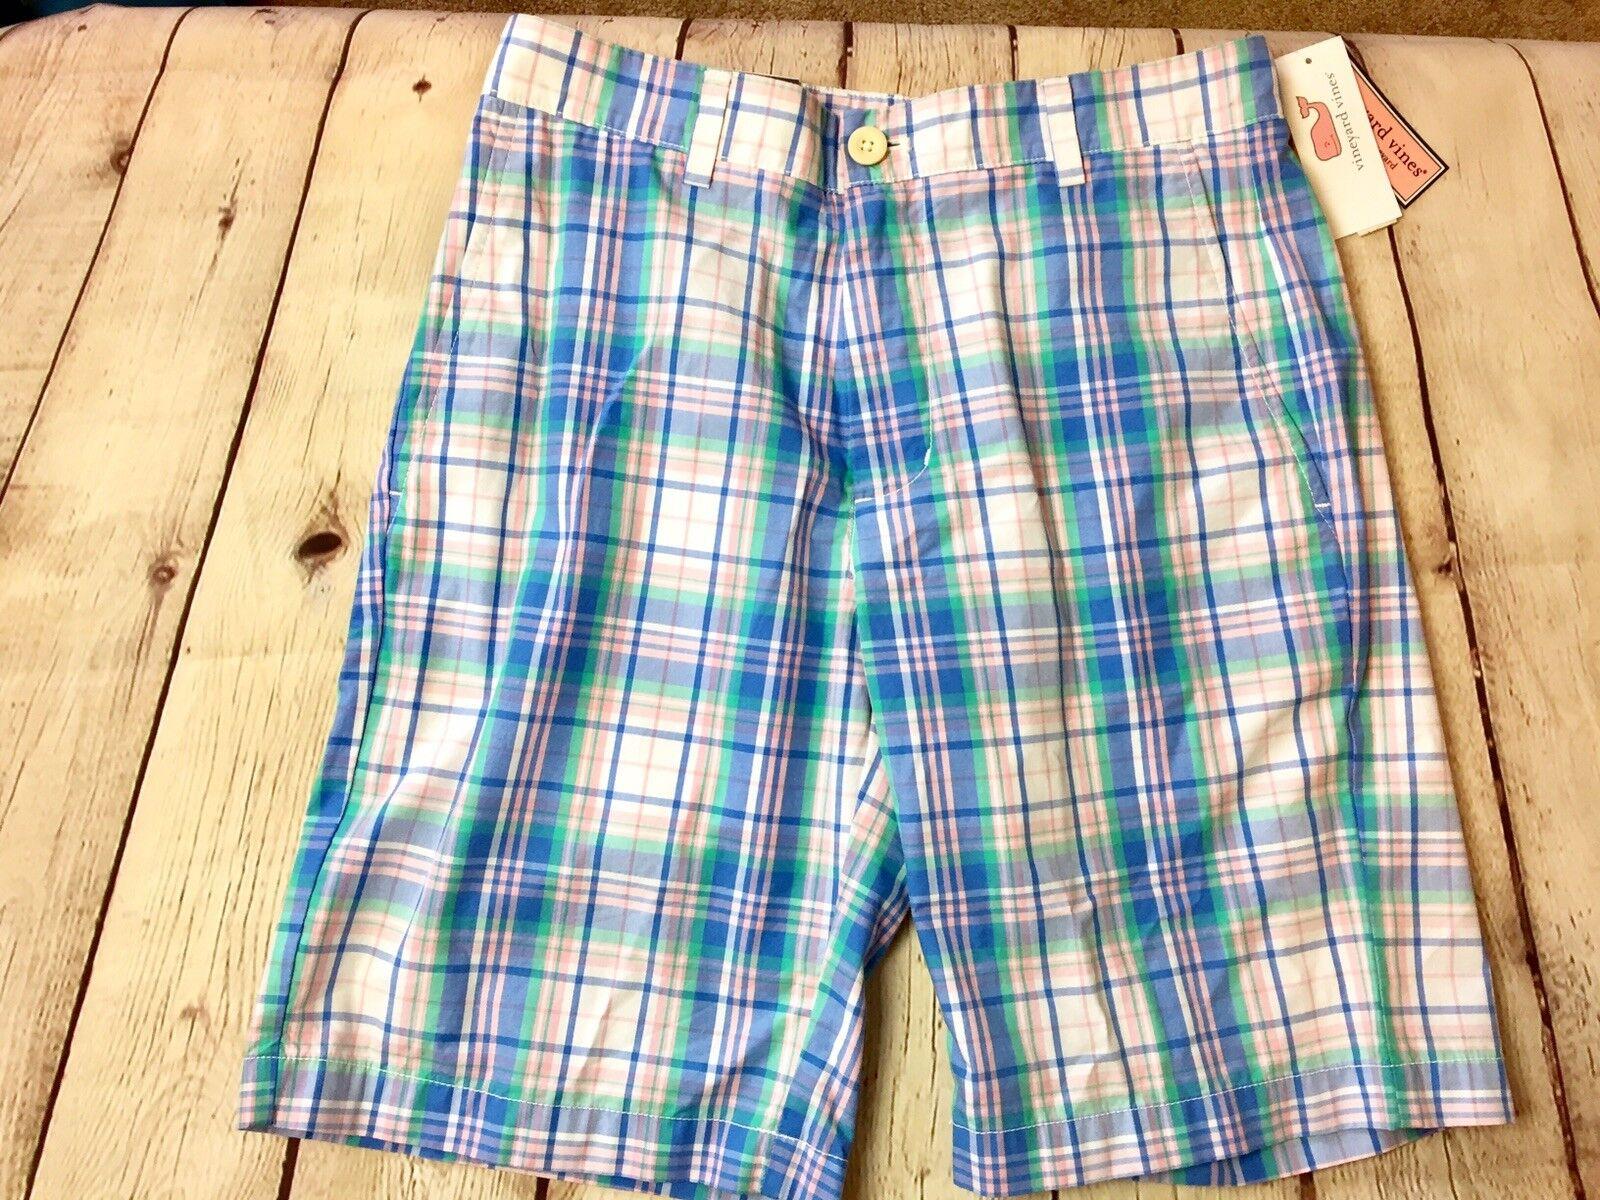 NWT Vineyard Vines classic fit 9  Breaker bluee Green plaid mens 28 shorts  O